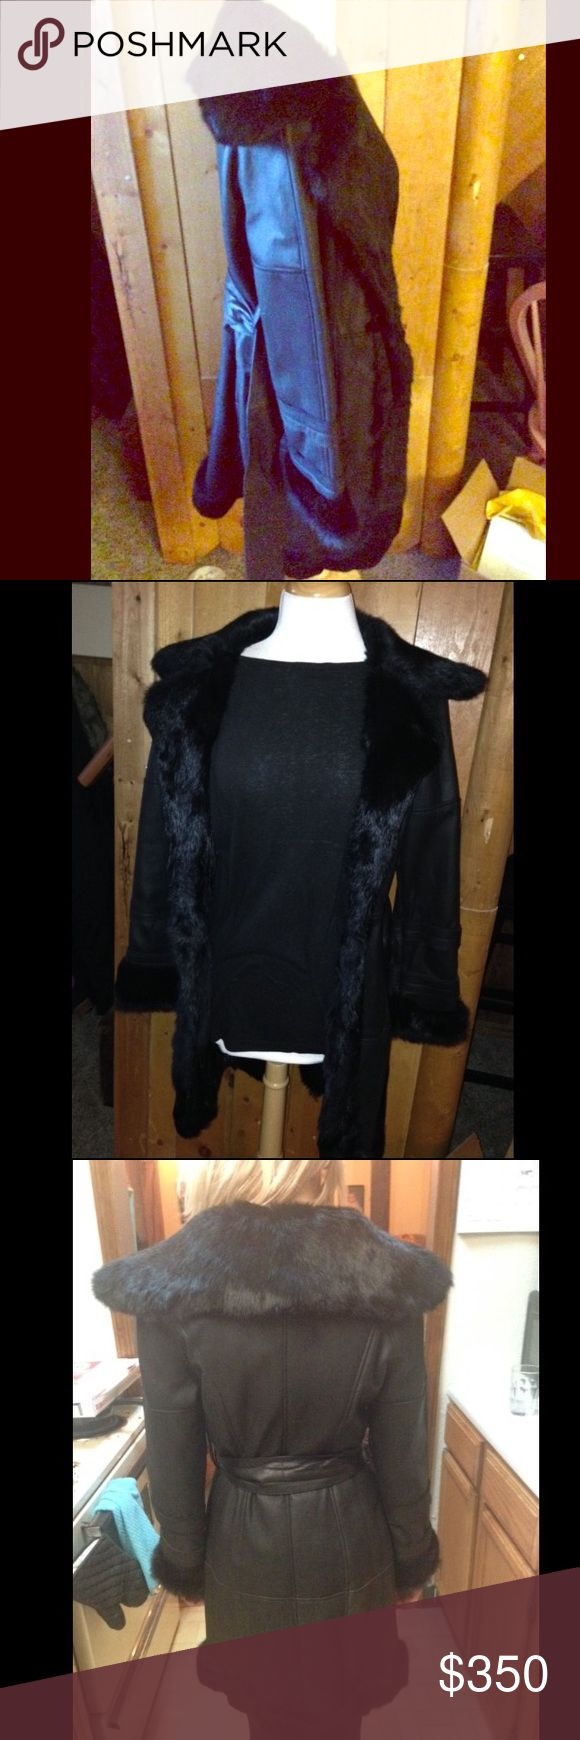 Women's Bebe XS Leather & Fur Peacoat long jacket Women's Bebe XS Leather & Fur Peacoat long jacket bebe Jackets & Coats Utility Jackets